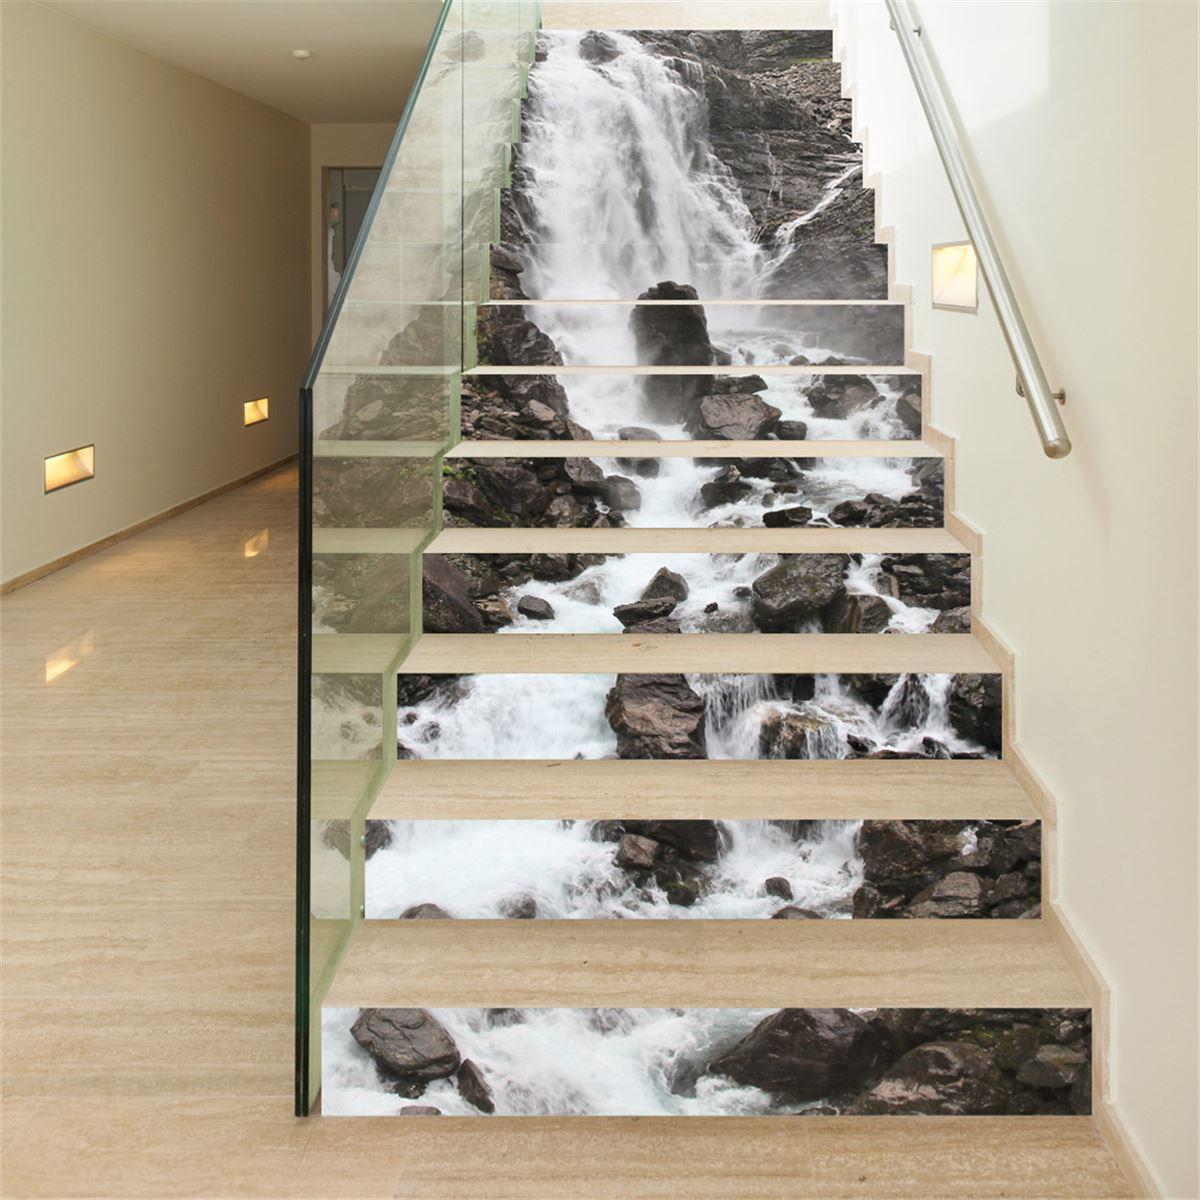 d pegatina escalera cascada unidsset pvc decoracin foto mural del vinilo cartel impermeable para sala de estar decoracin